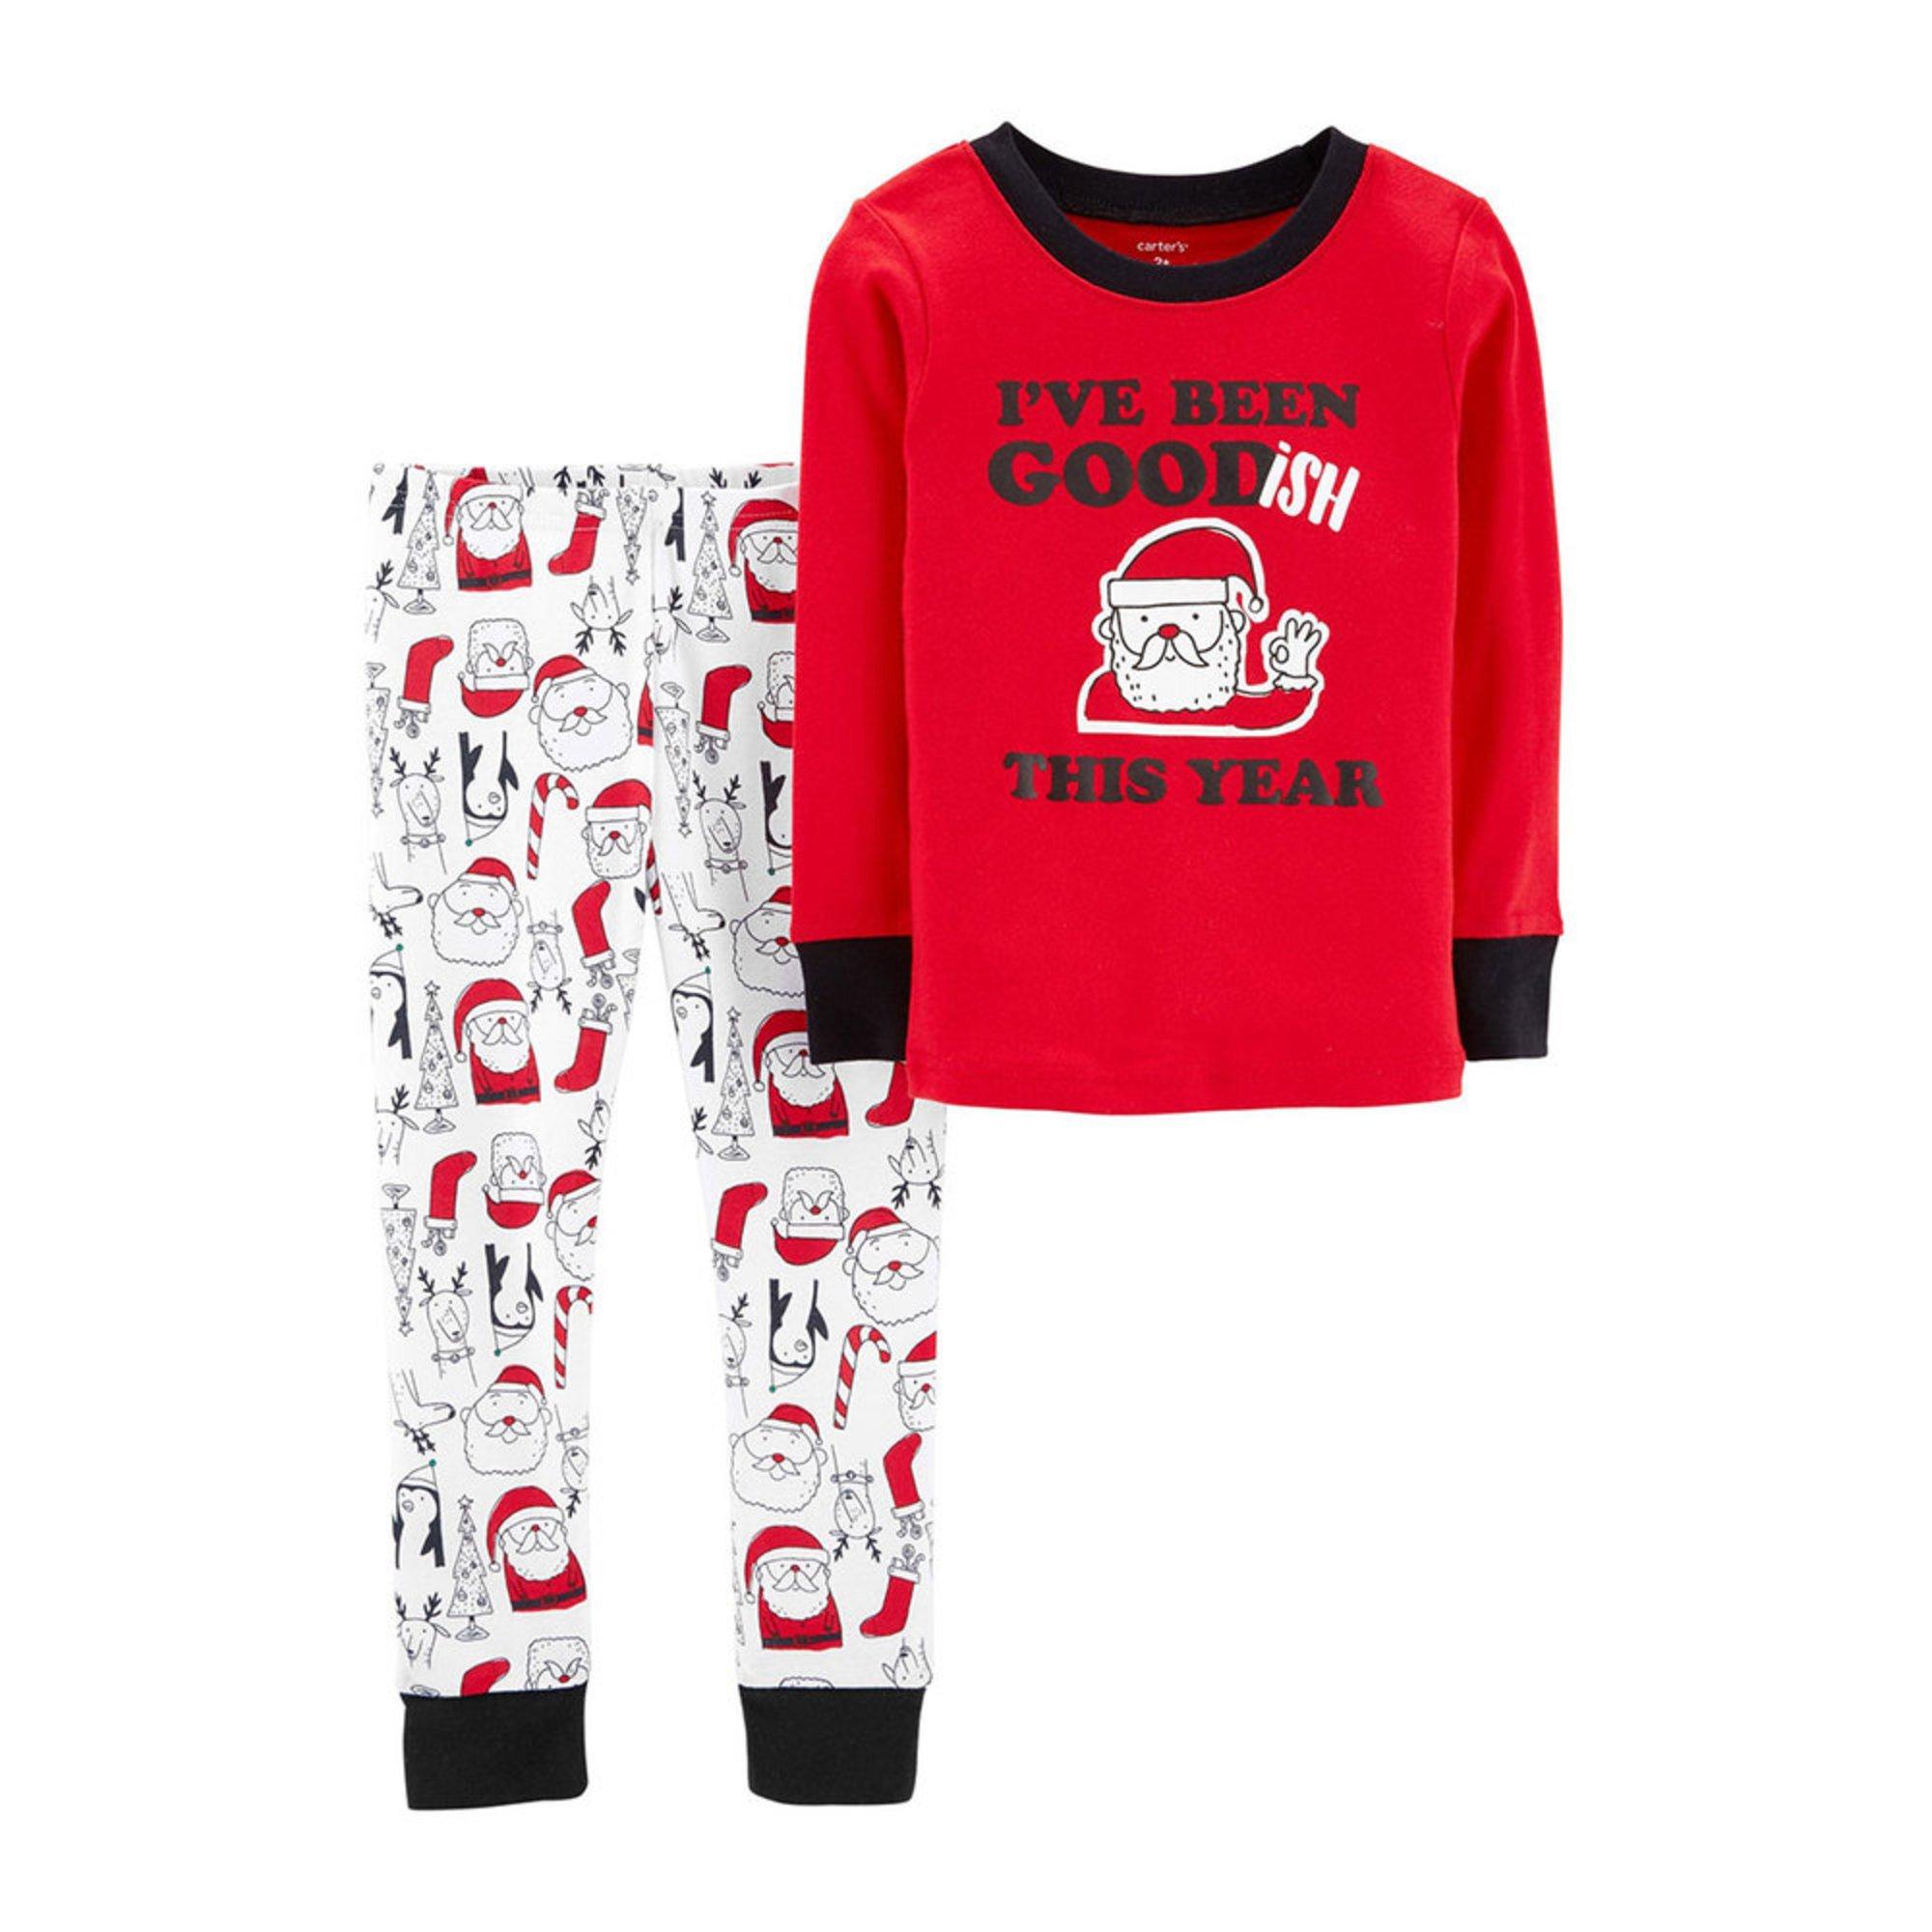 f9d934e60 Carter s Baby Boys  Goodish 2-piece Holiday Pajamas Set